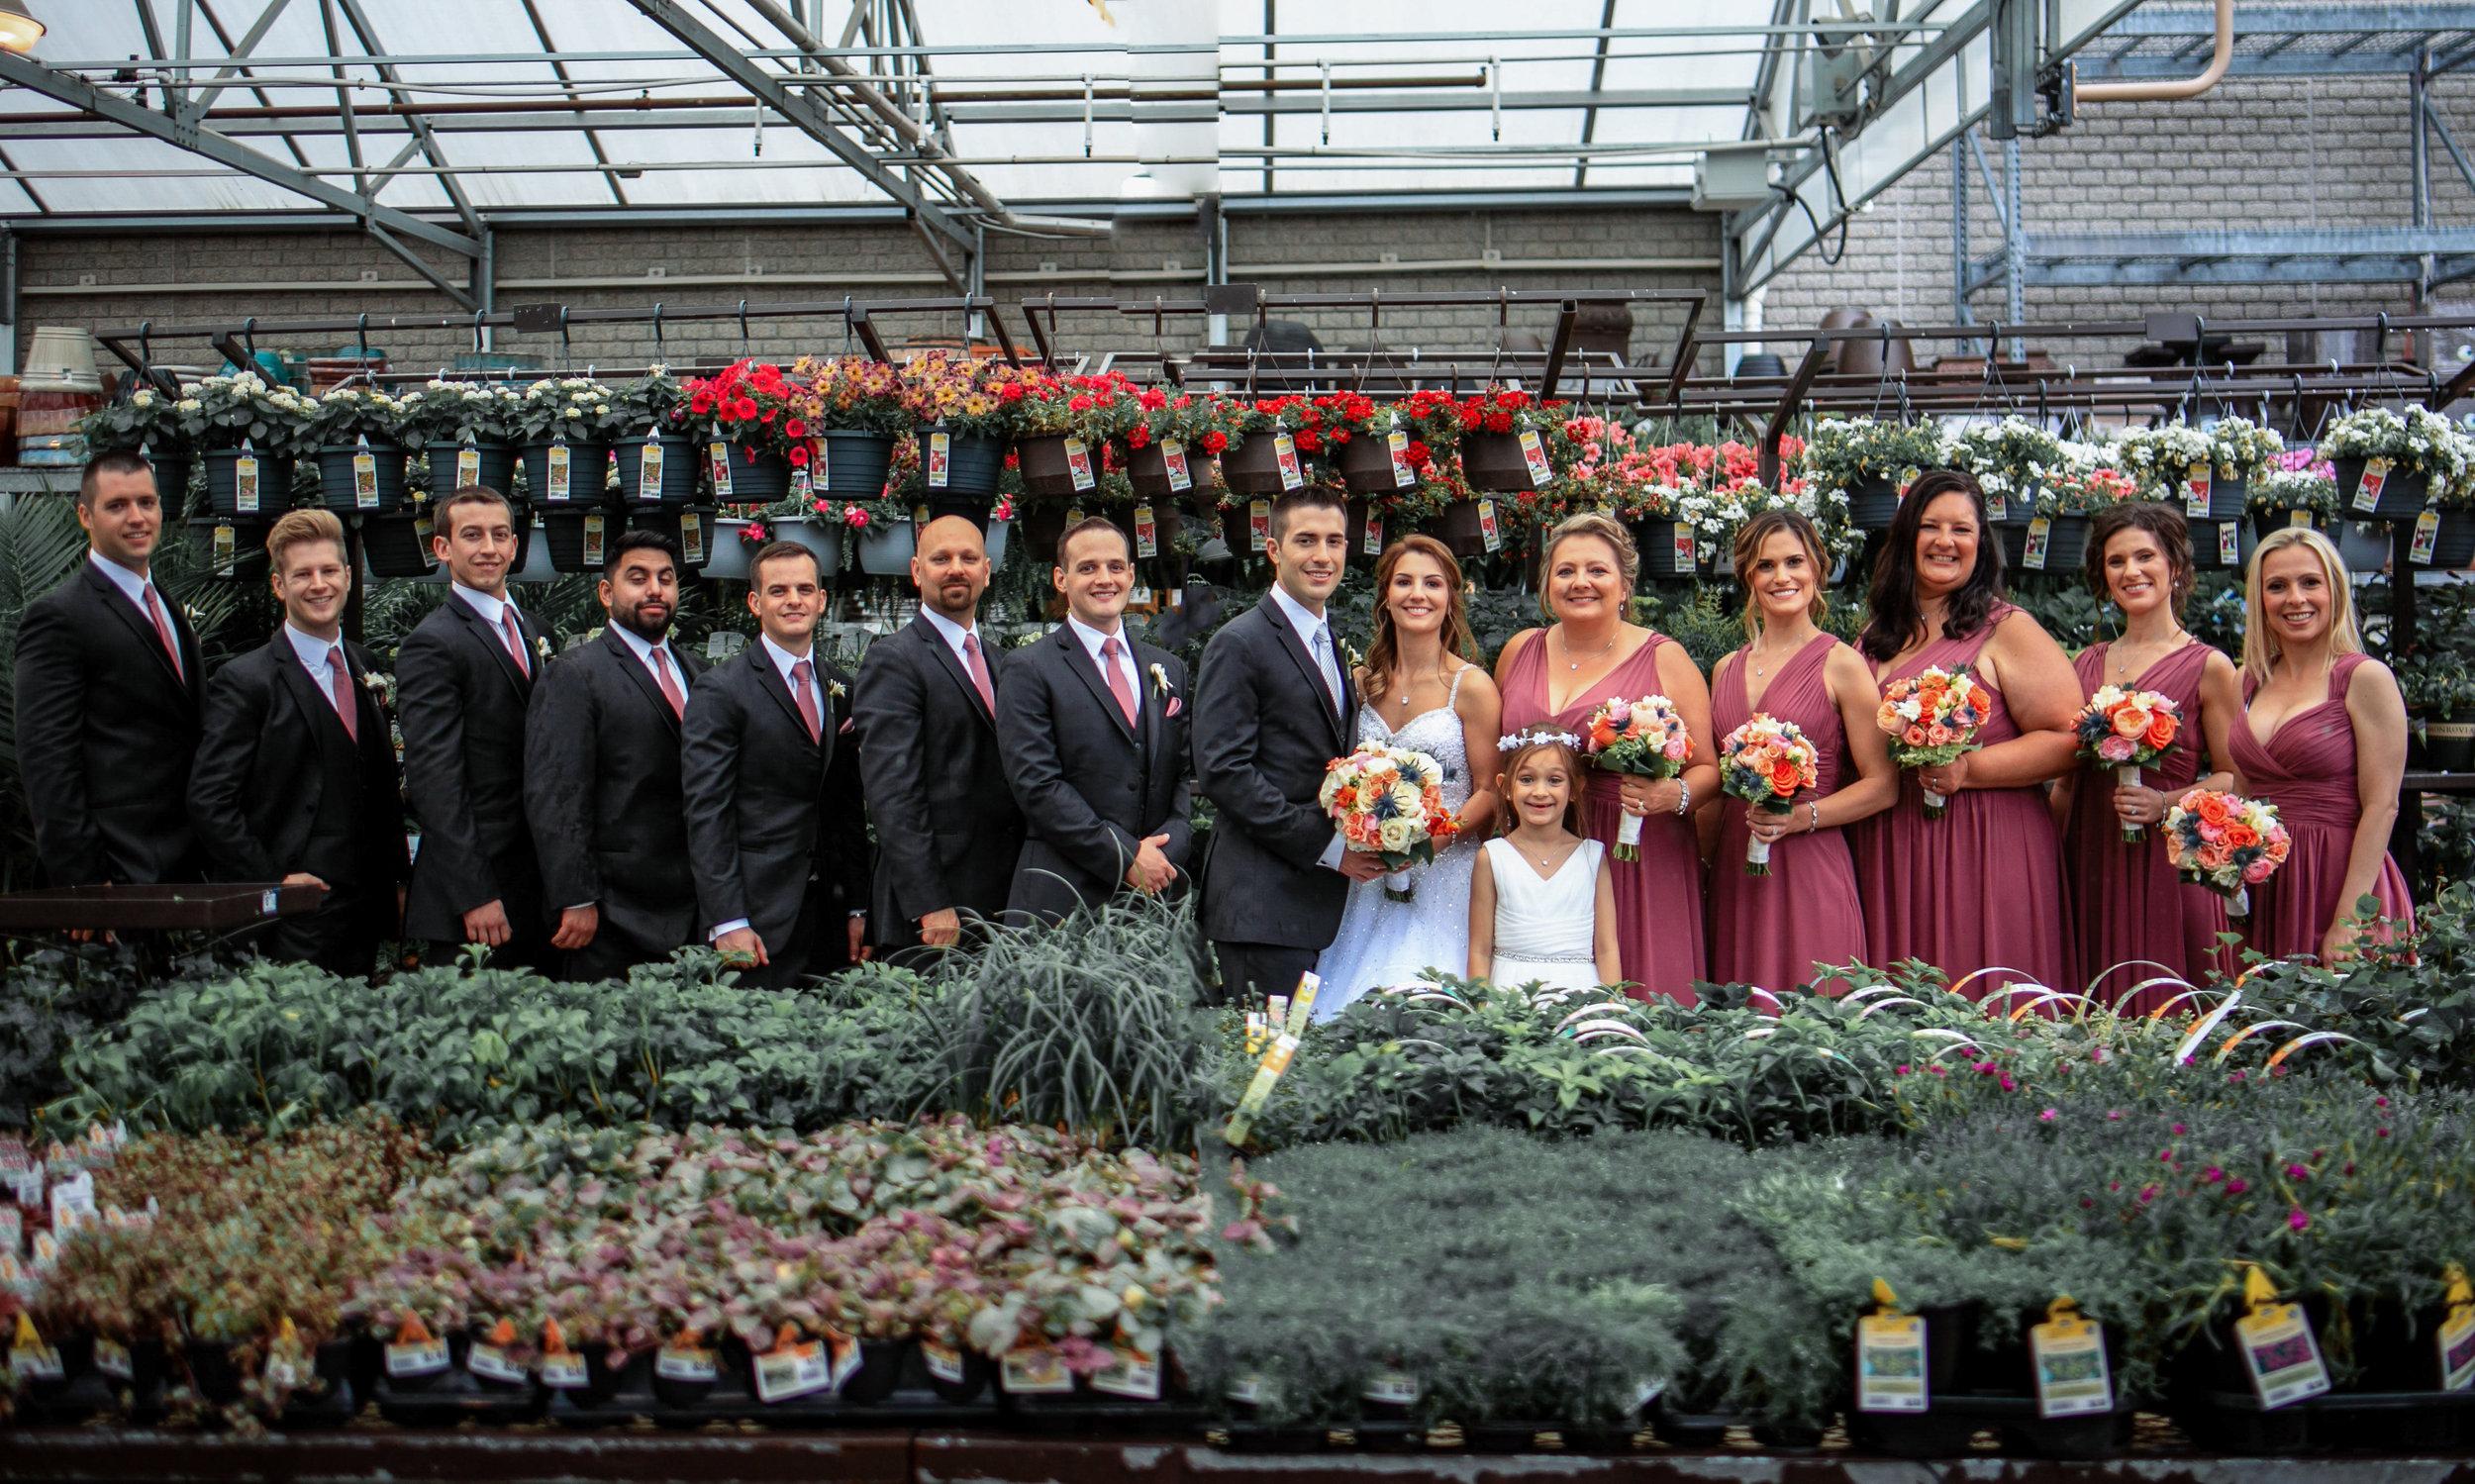 Wedding-couple-takes-photos-at-lowes-hardware-due-to-rain29.jpg